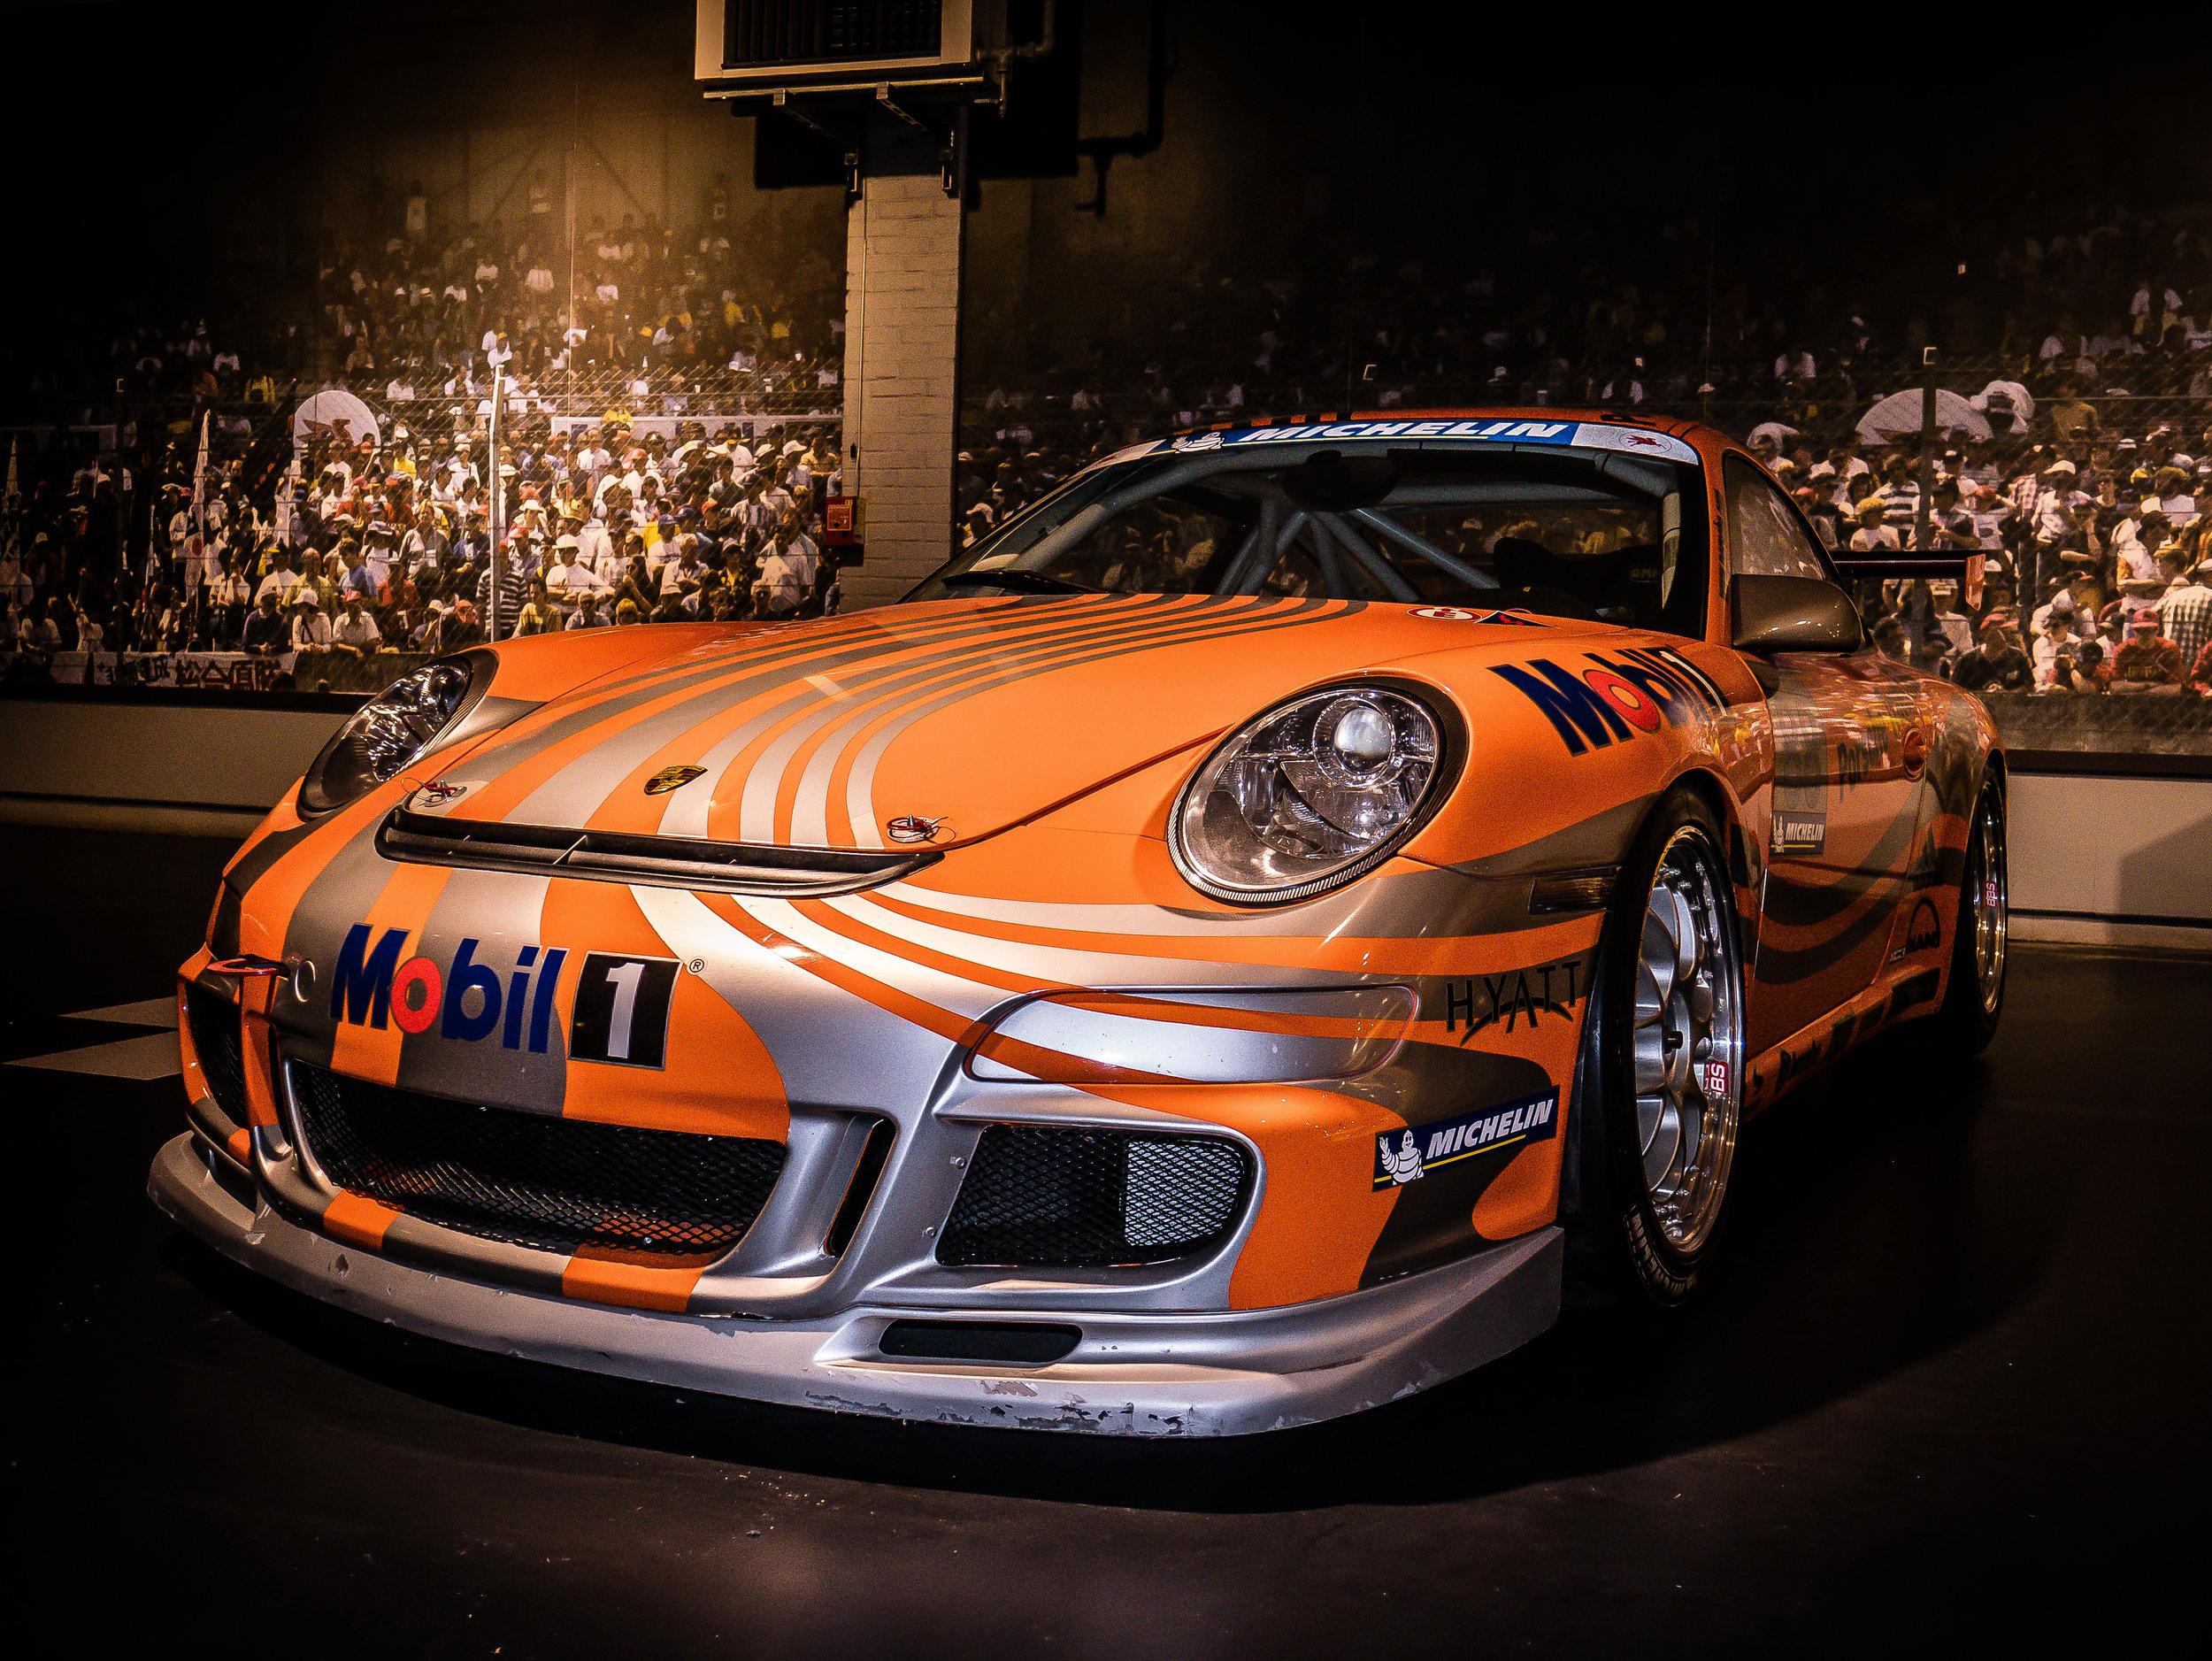 A racing Porsche (Credit: Nicolai Rauser)